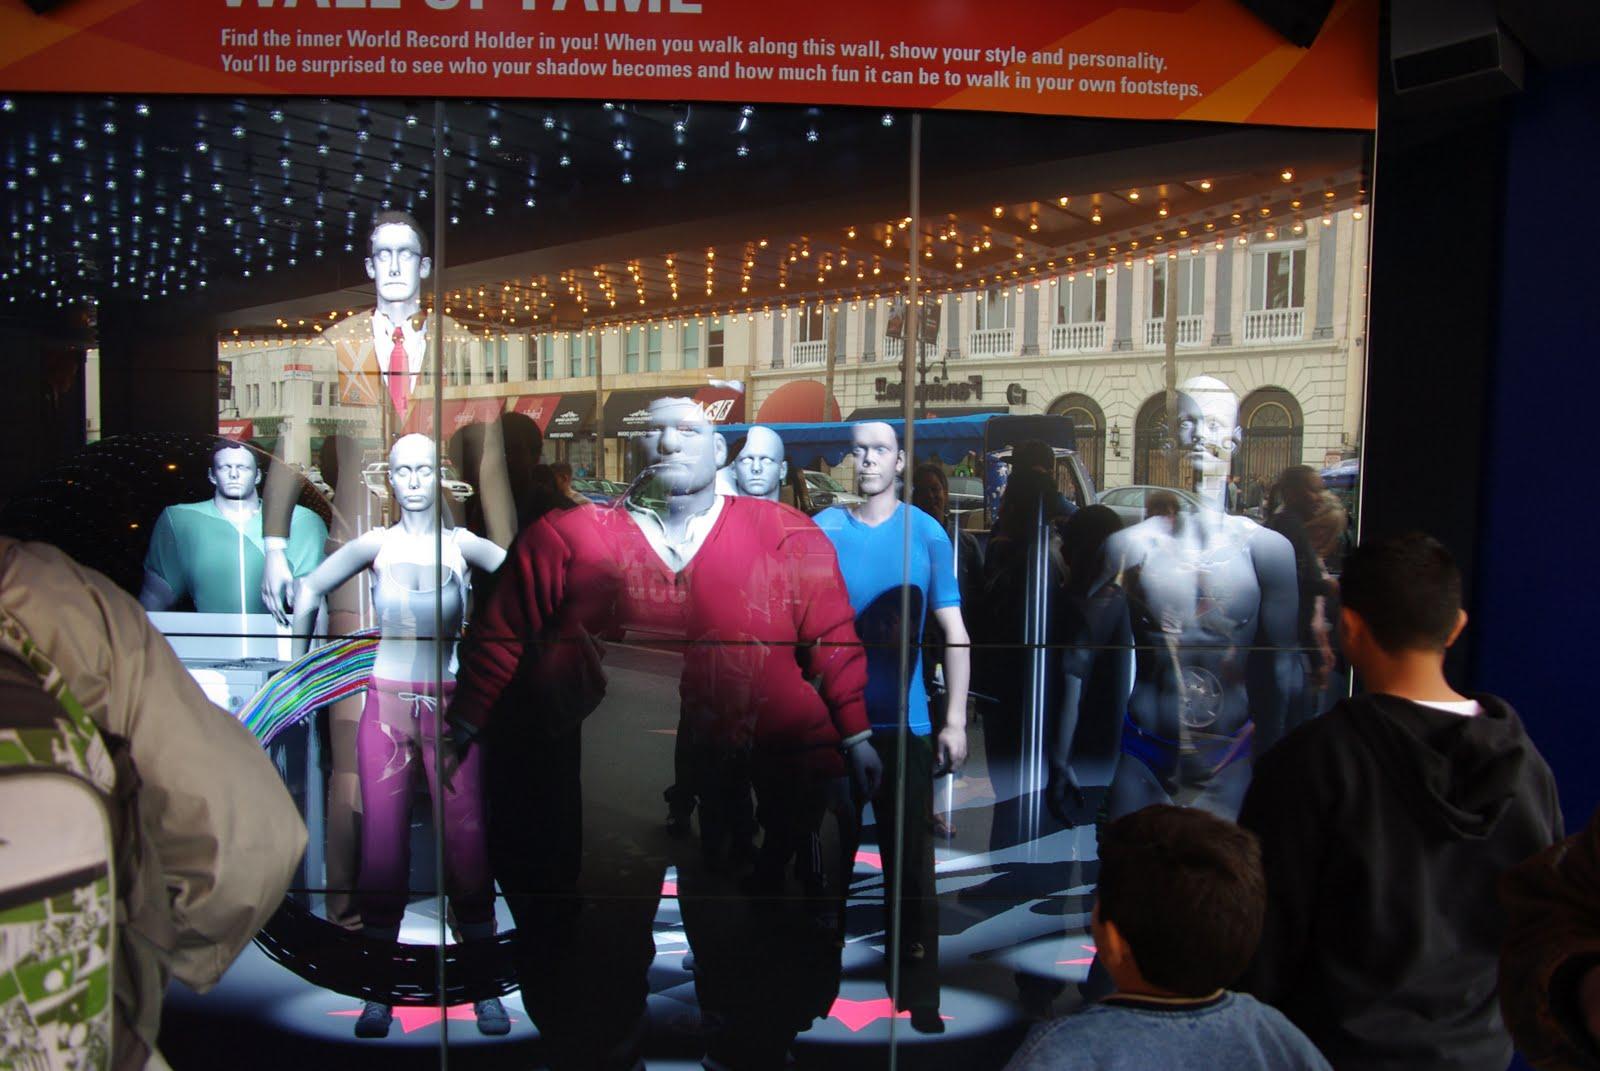 http://4.bp.blogspot.com/_gHFA9p185q0/TNIdNypAqTI/AAAAAAAABdE/IVRC5yniC9M/s1600/Guinness+World+Records+Museum-5.jpg